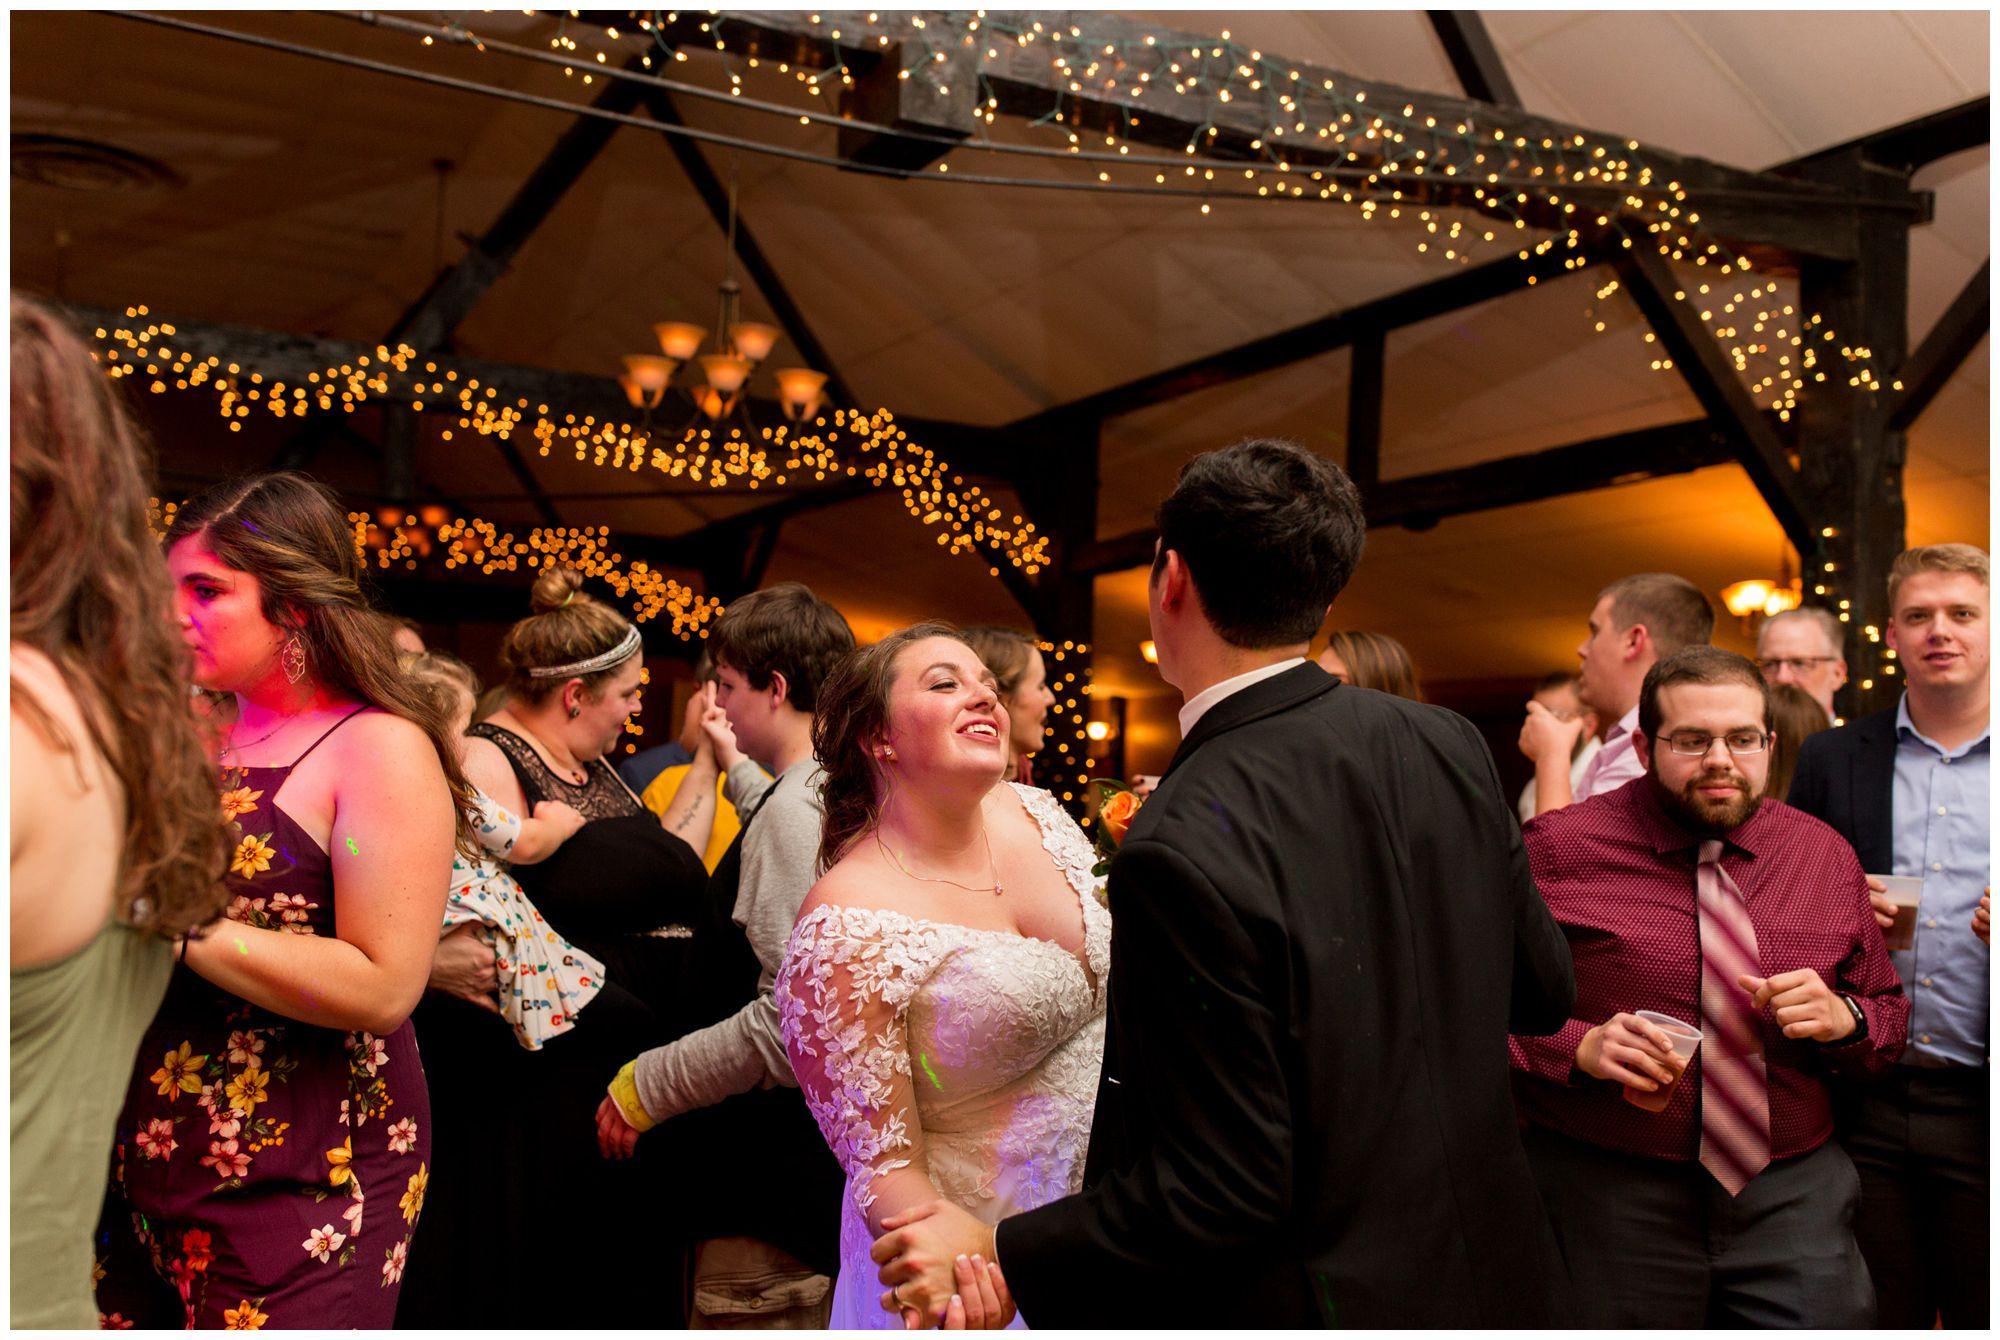 bride and groom dance during wedding reception at Goeglein Homestead in Fort Wayne